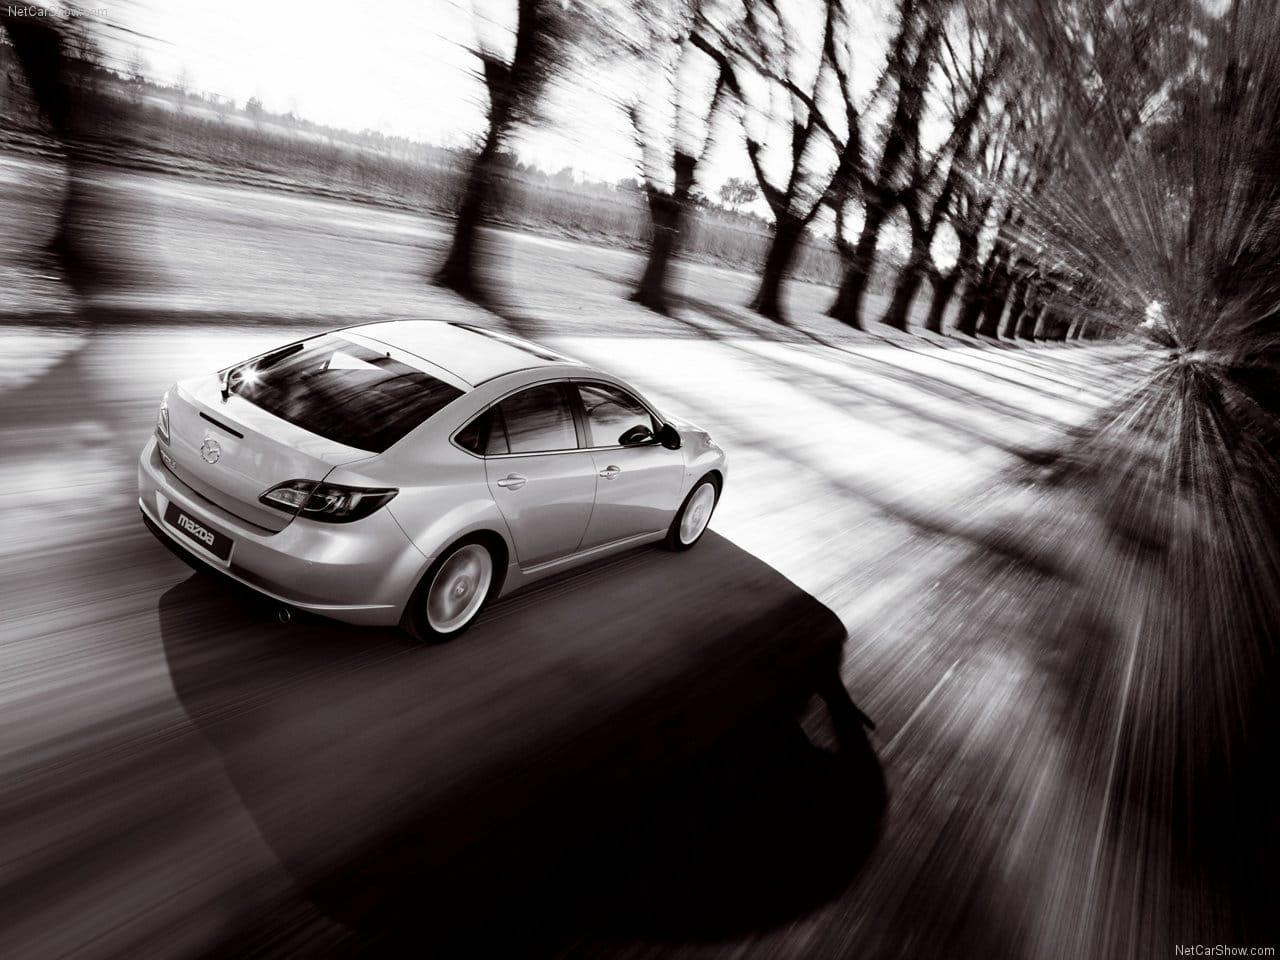 Mazda 6, Mazda, 6, RX8, family car, Japanese car, car sales, cheap car, Mondeo, Insignia, Passat, A4, 3 Series, motoring, automotive, family car, buying a car, car review, Mazda 6 review, car, cars, ebay, ebay motors, autotrader